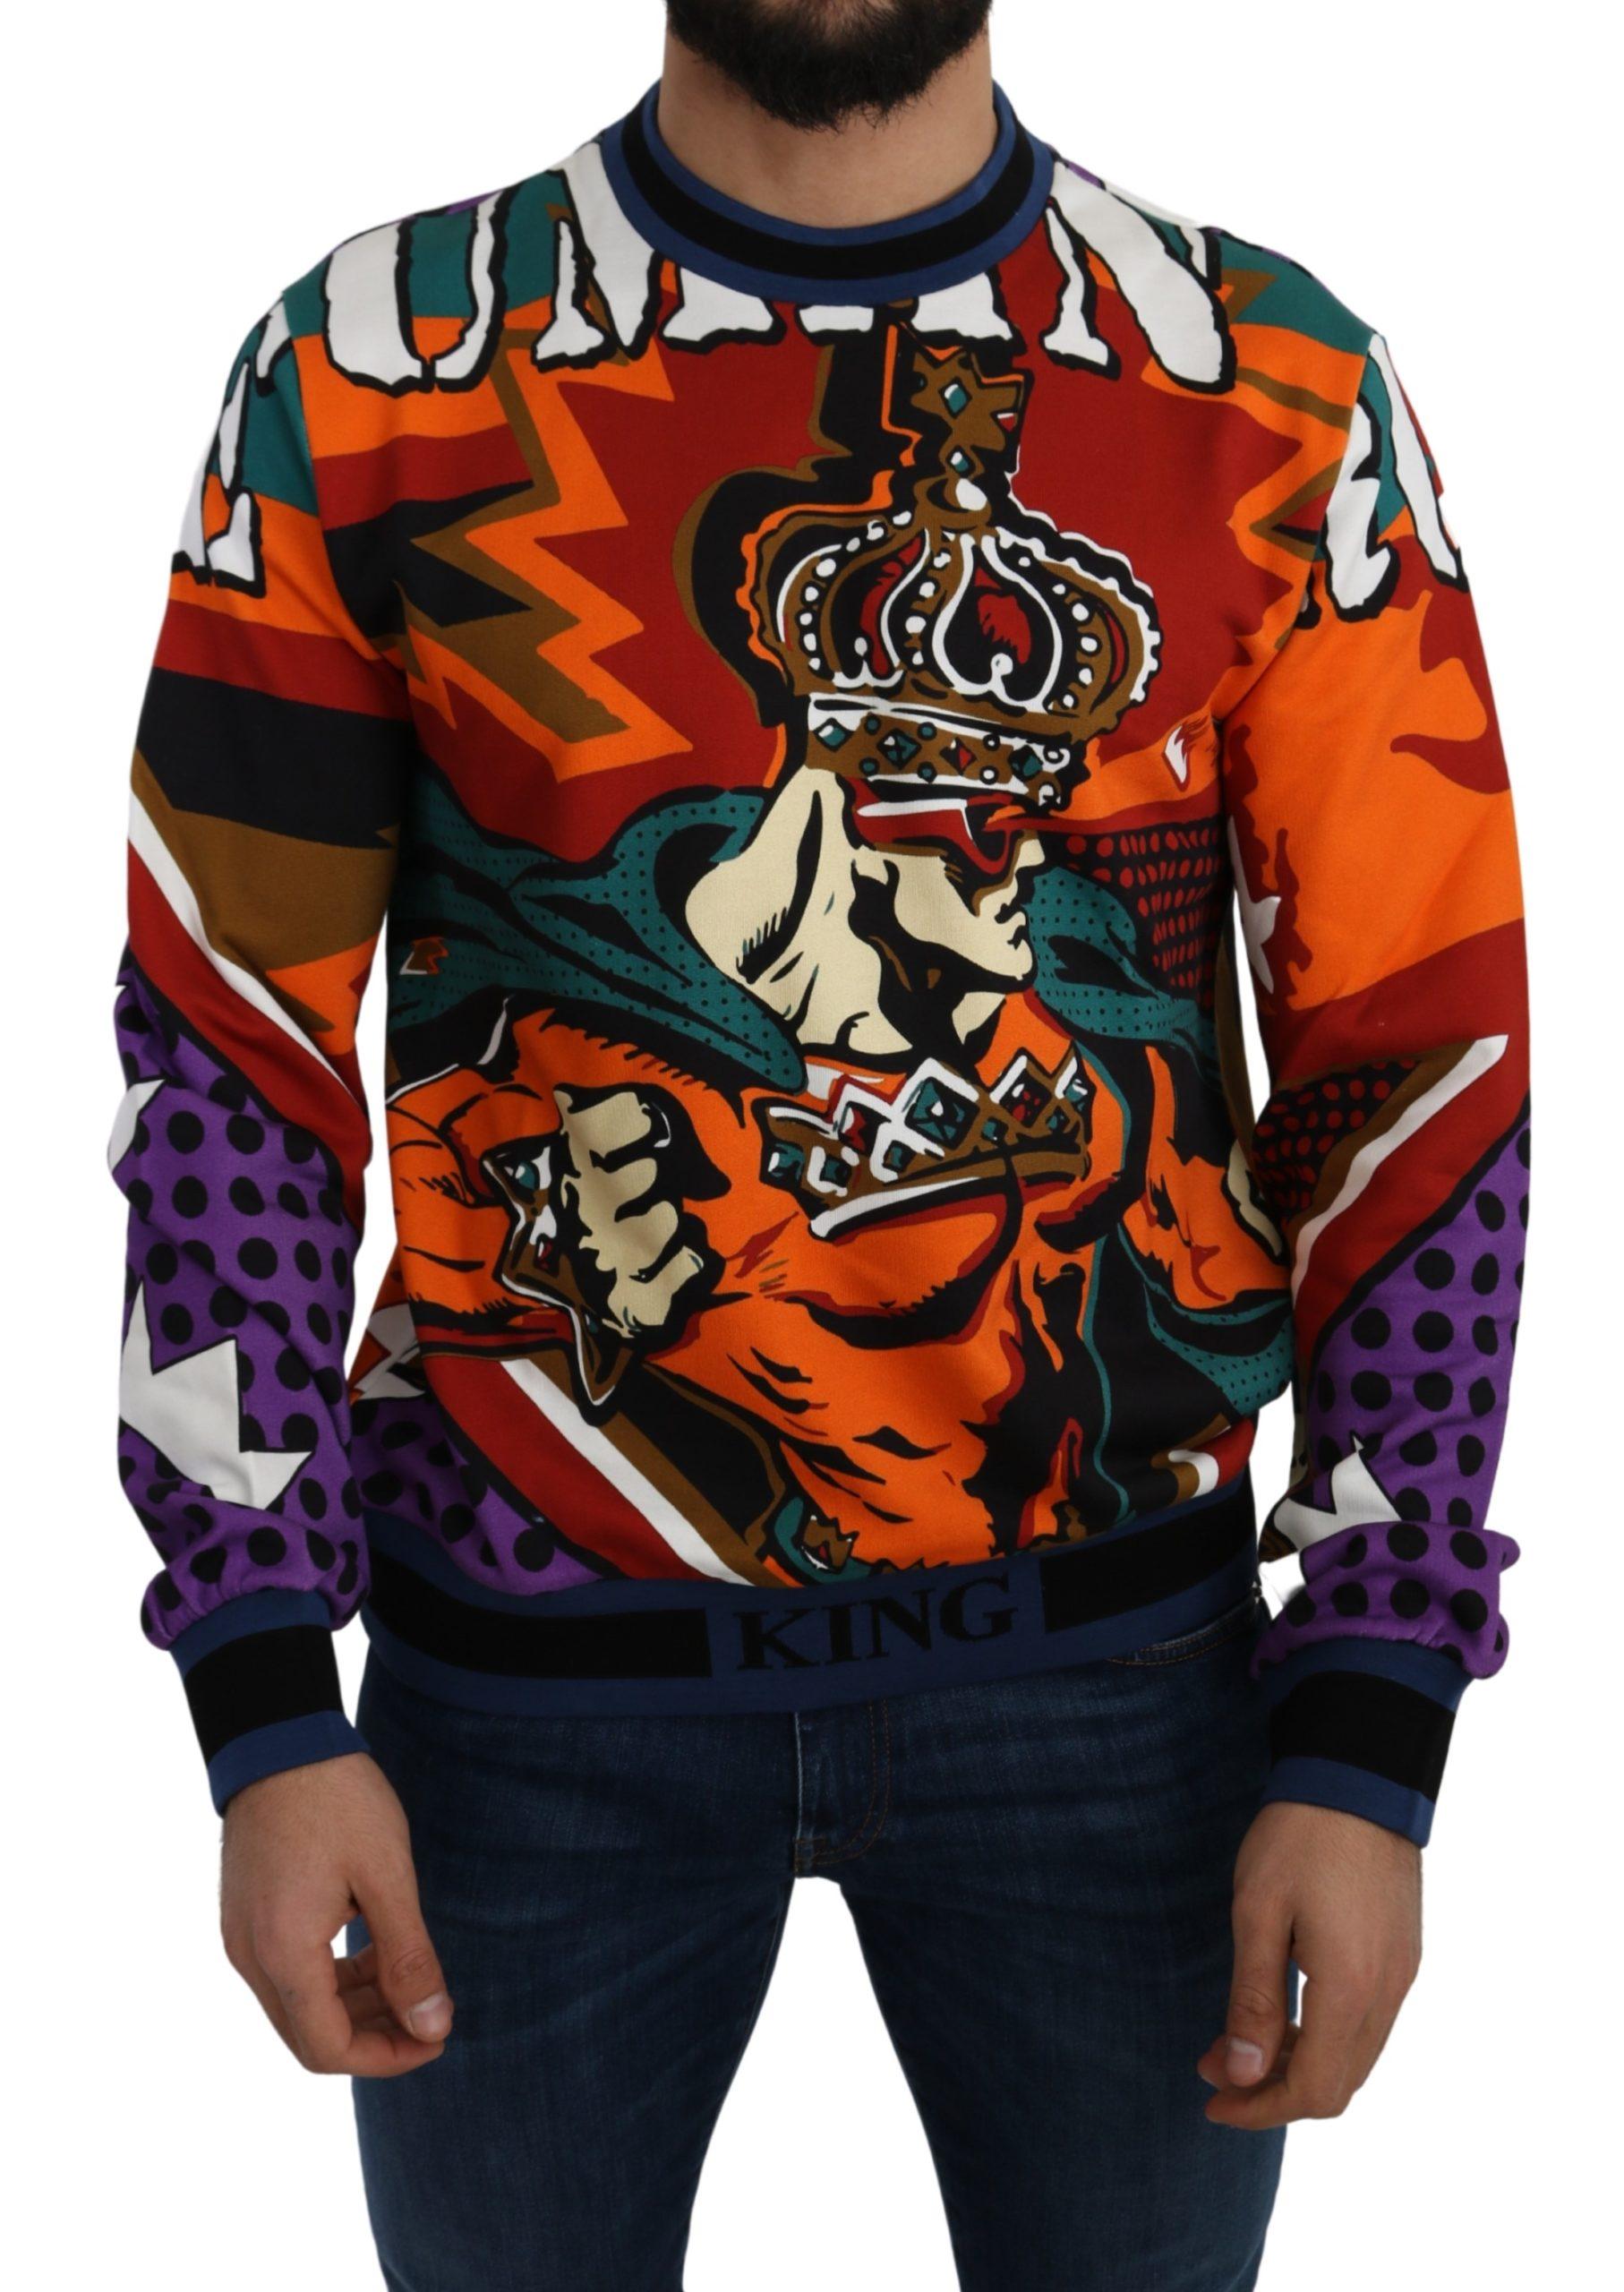 Dolce & Gabbana Men's Super Crown Cotton Crewneck Pullover Multicolor TSH5100 - IT44   XS